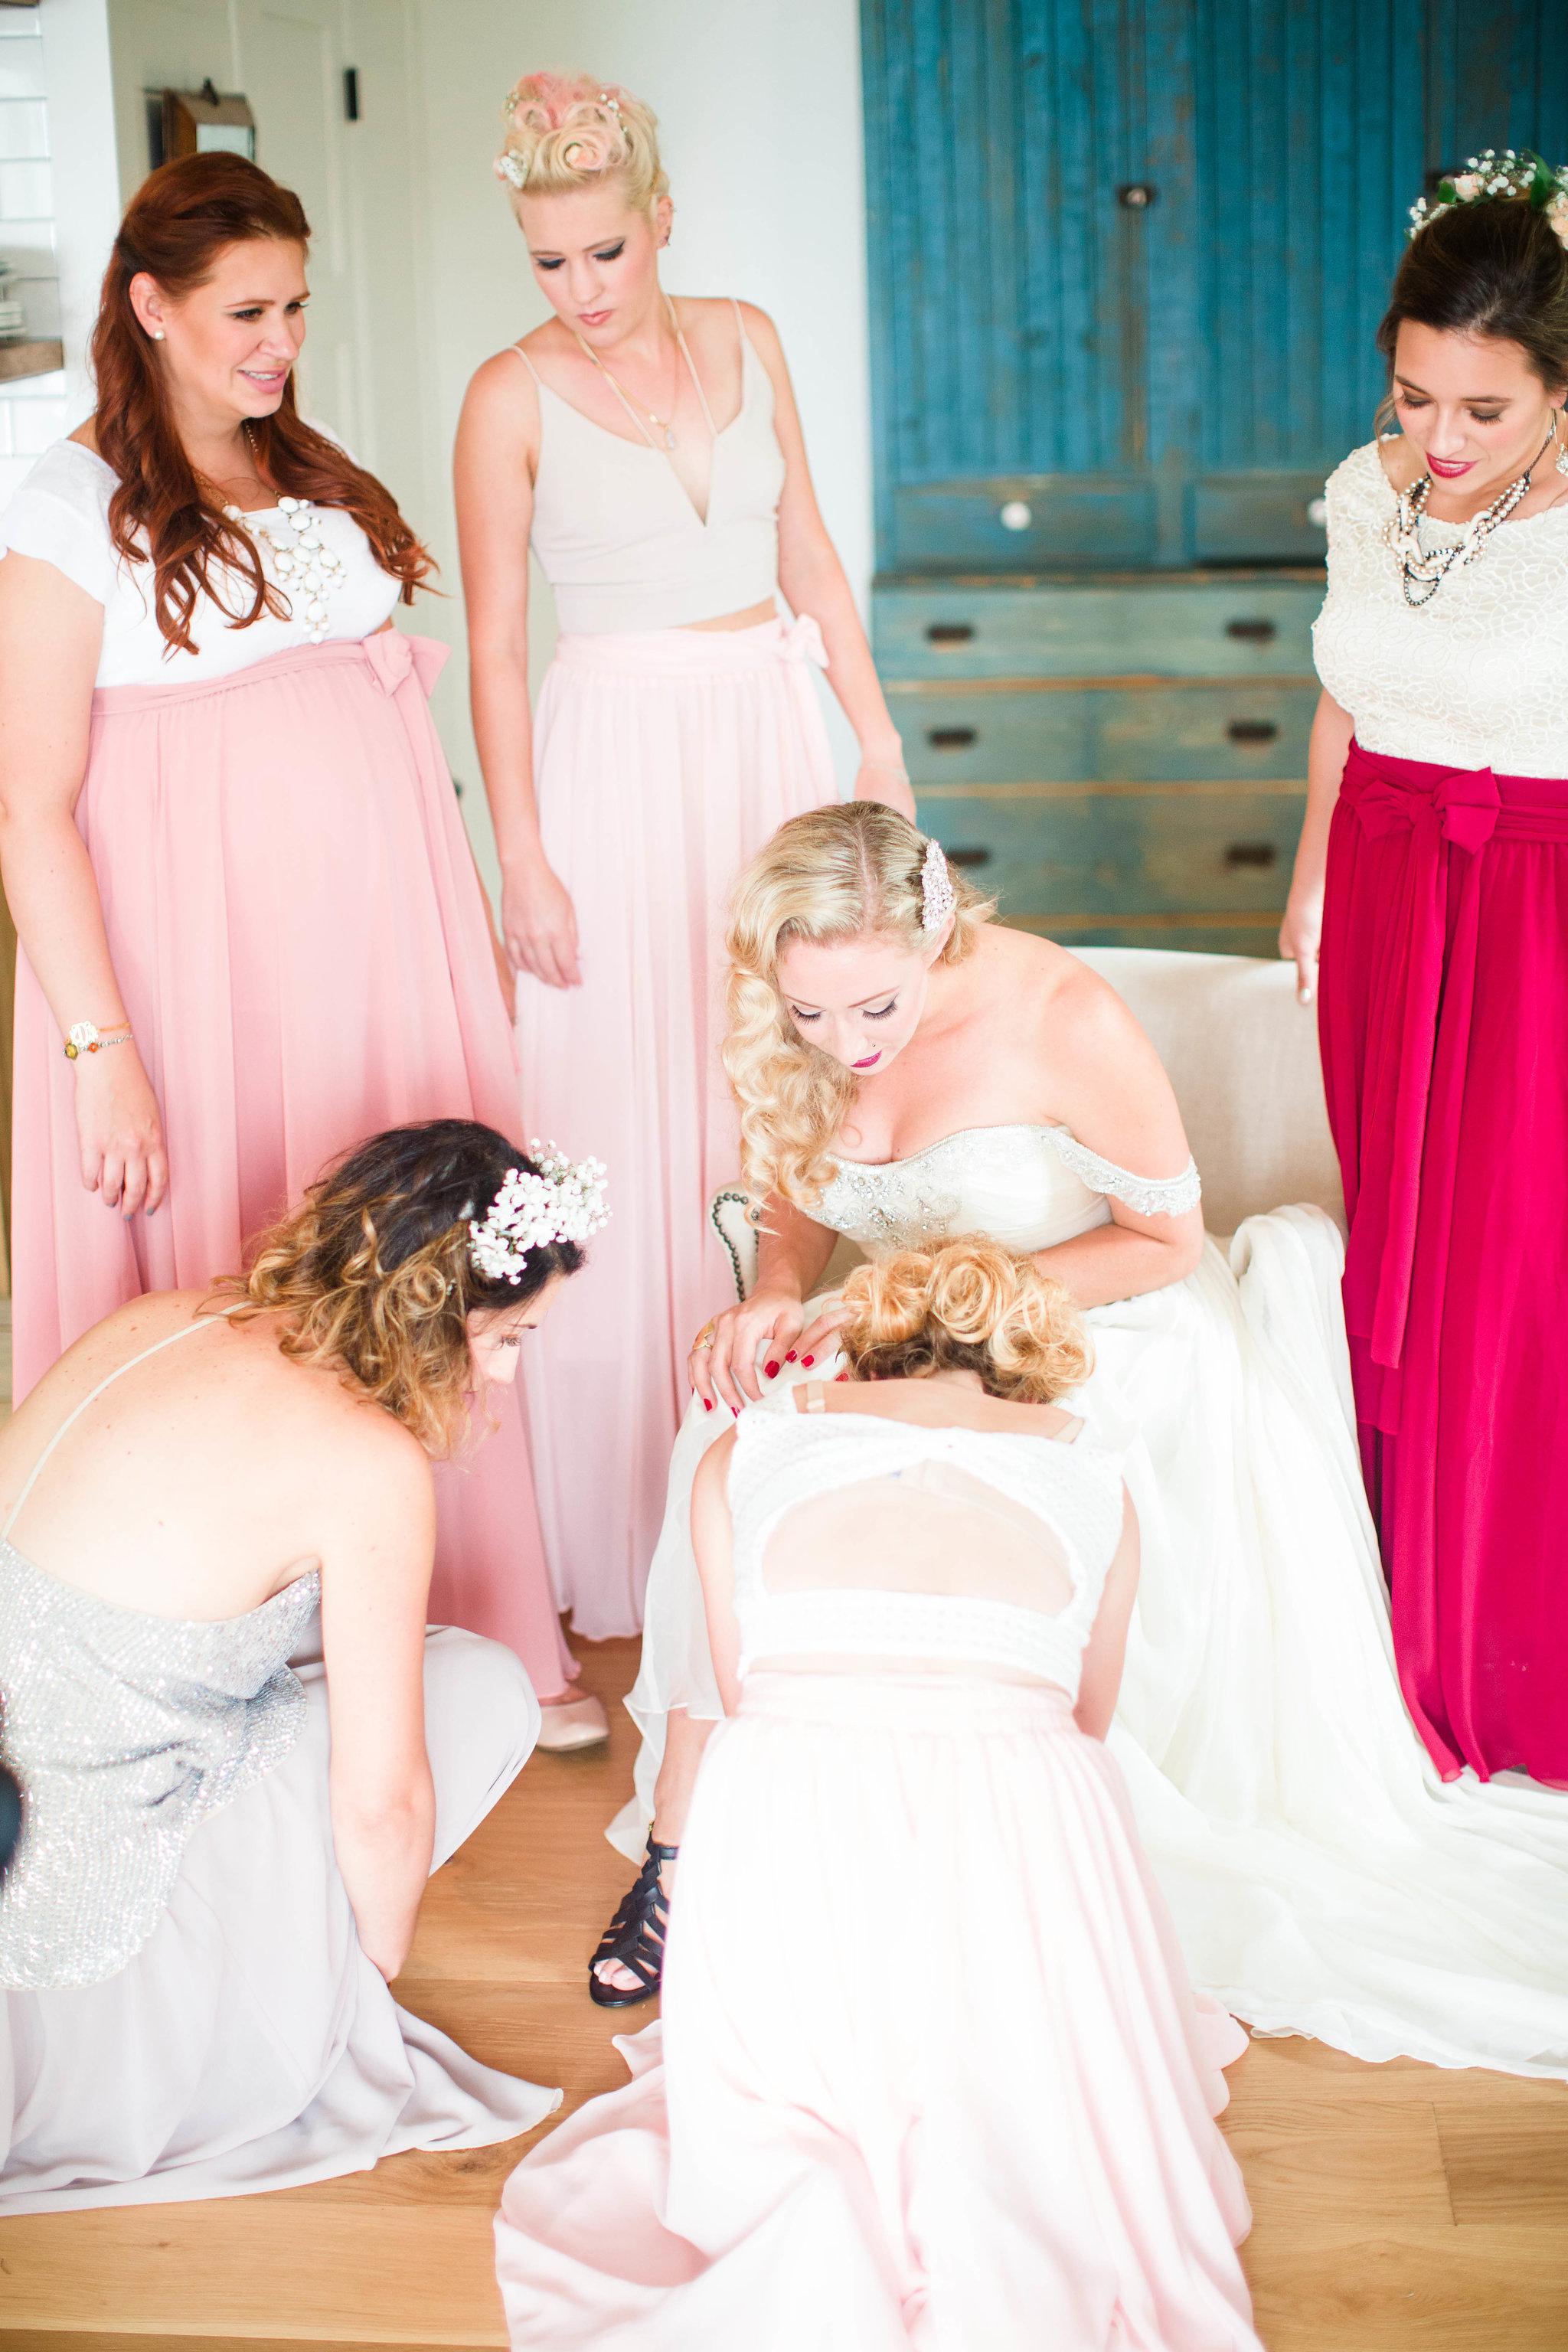 bellingham-wedding-backayard-by-seattle-wedding-photographer-adina-preston-10.jpg